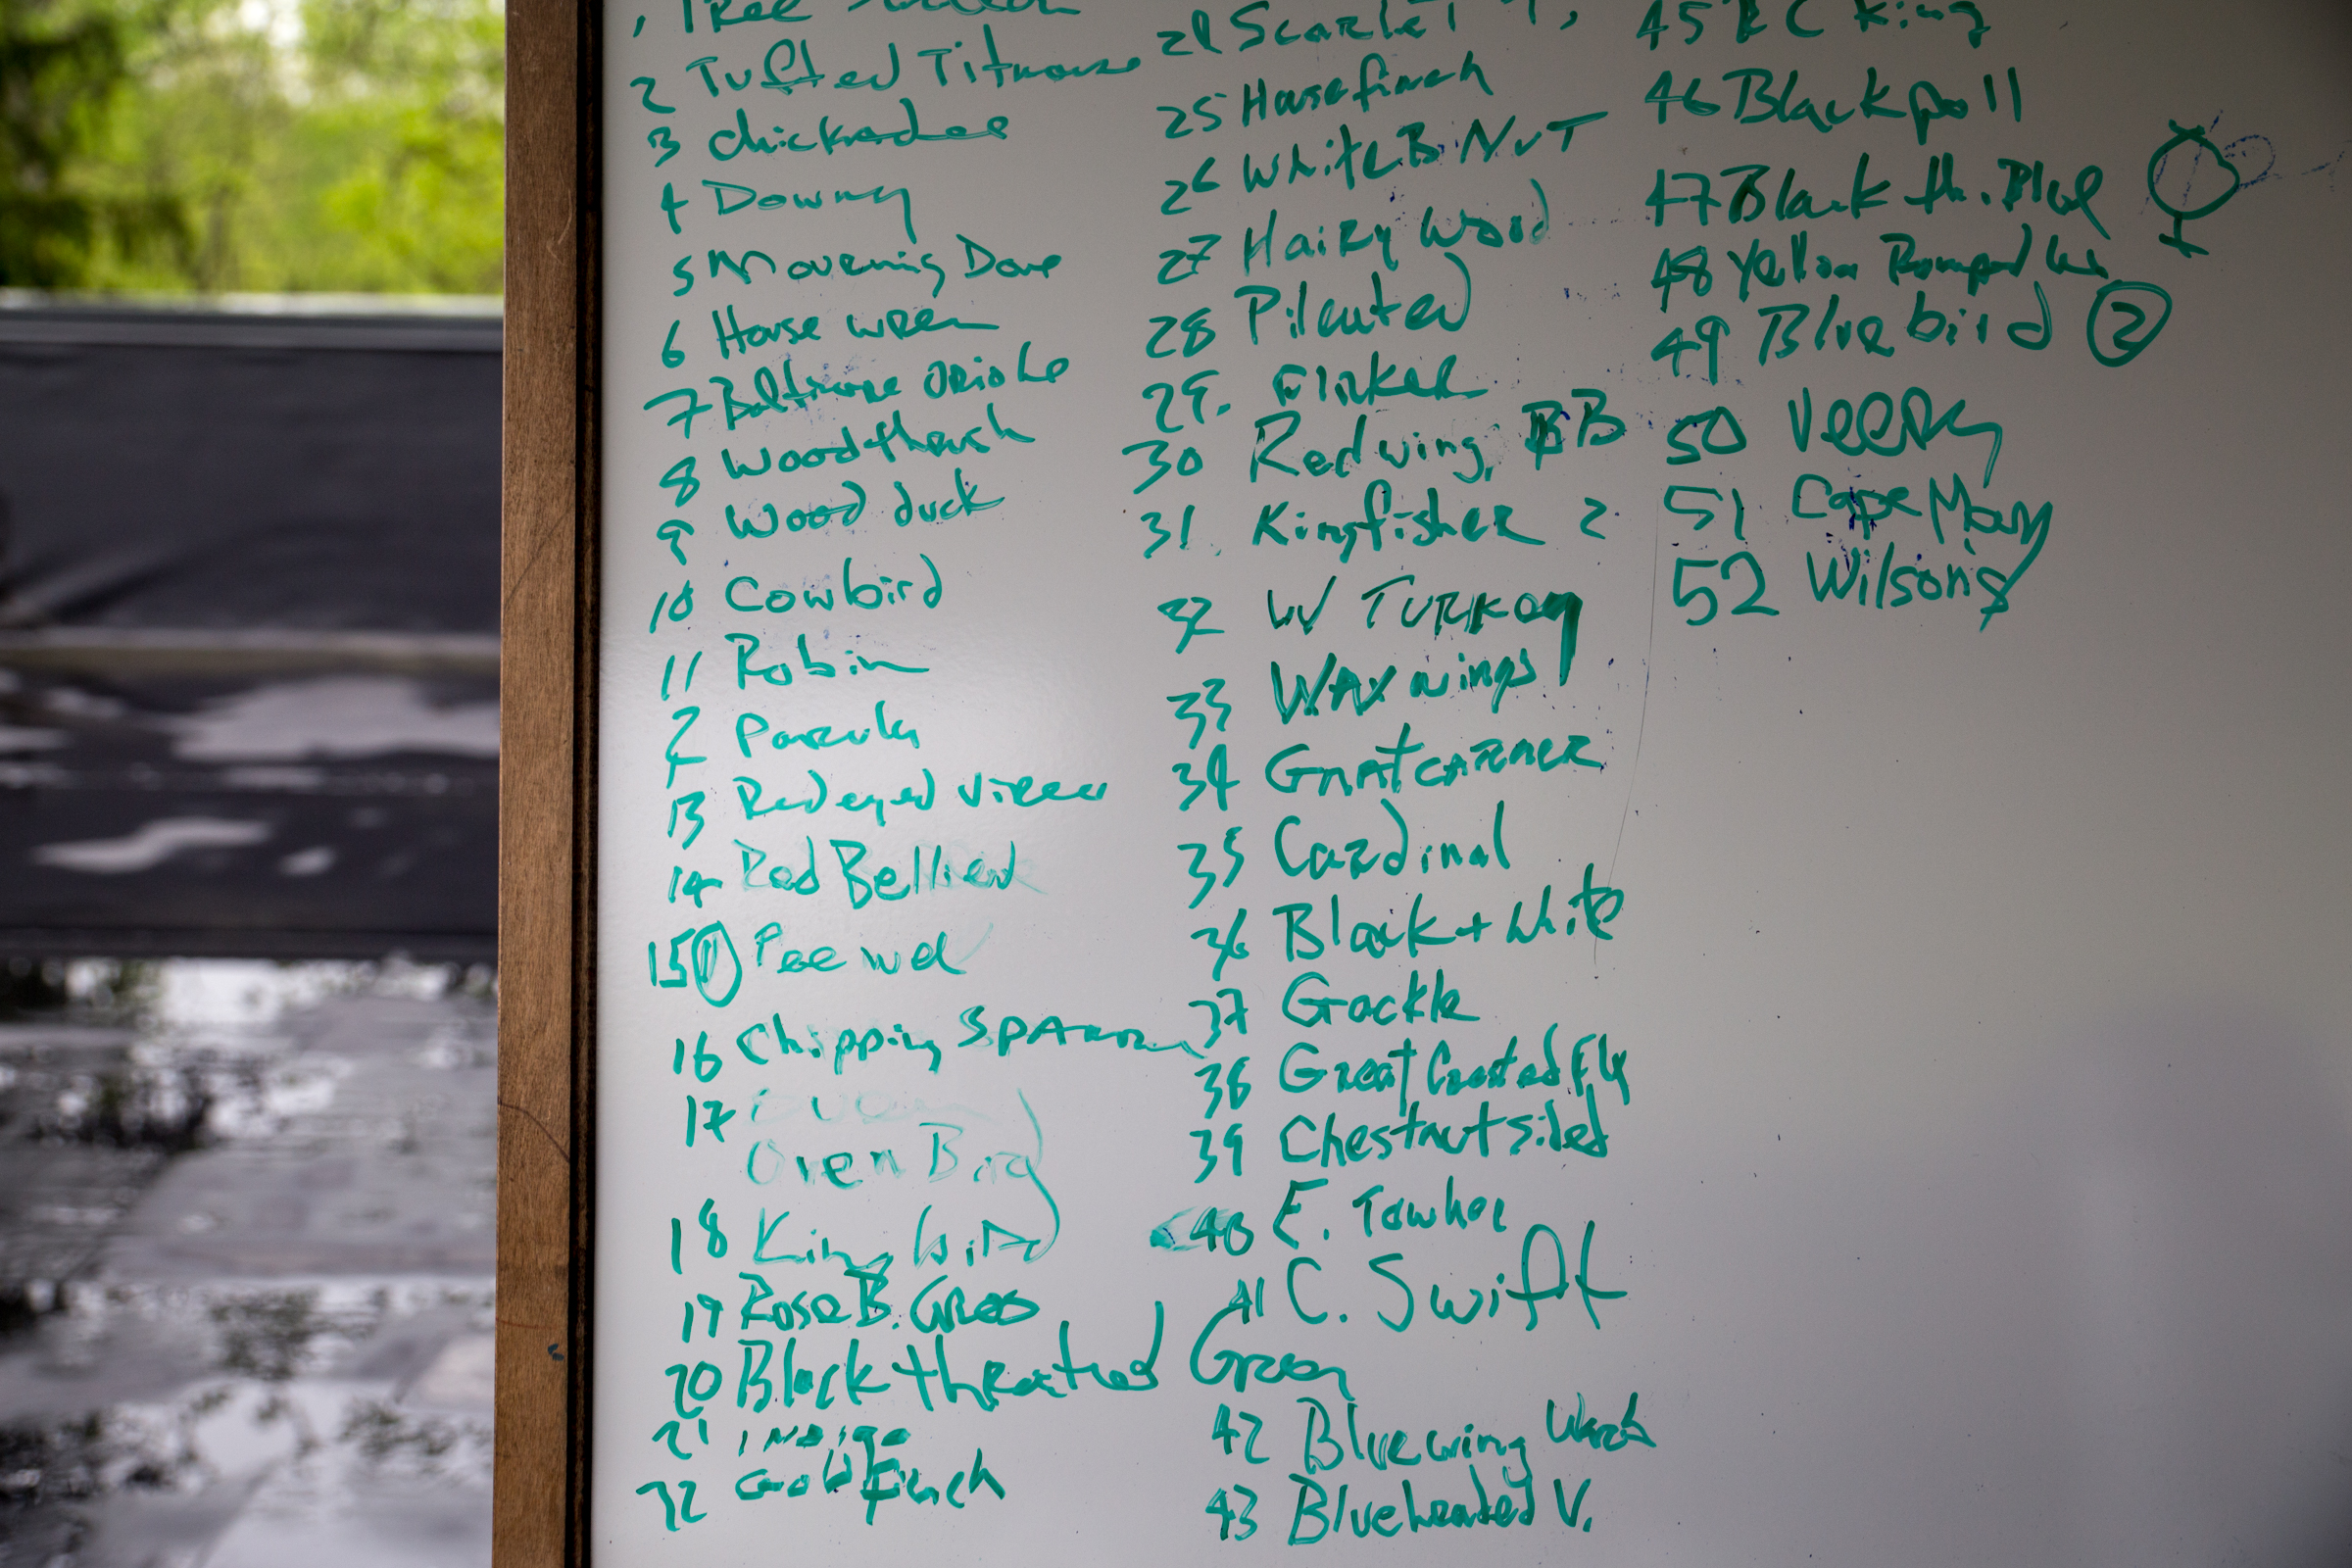 The Deckcissels keep track of their sightings. Camilla Cerea/Audubon